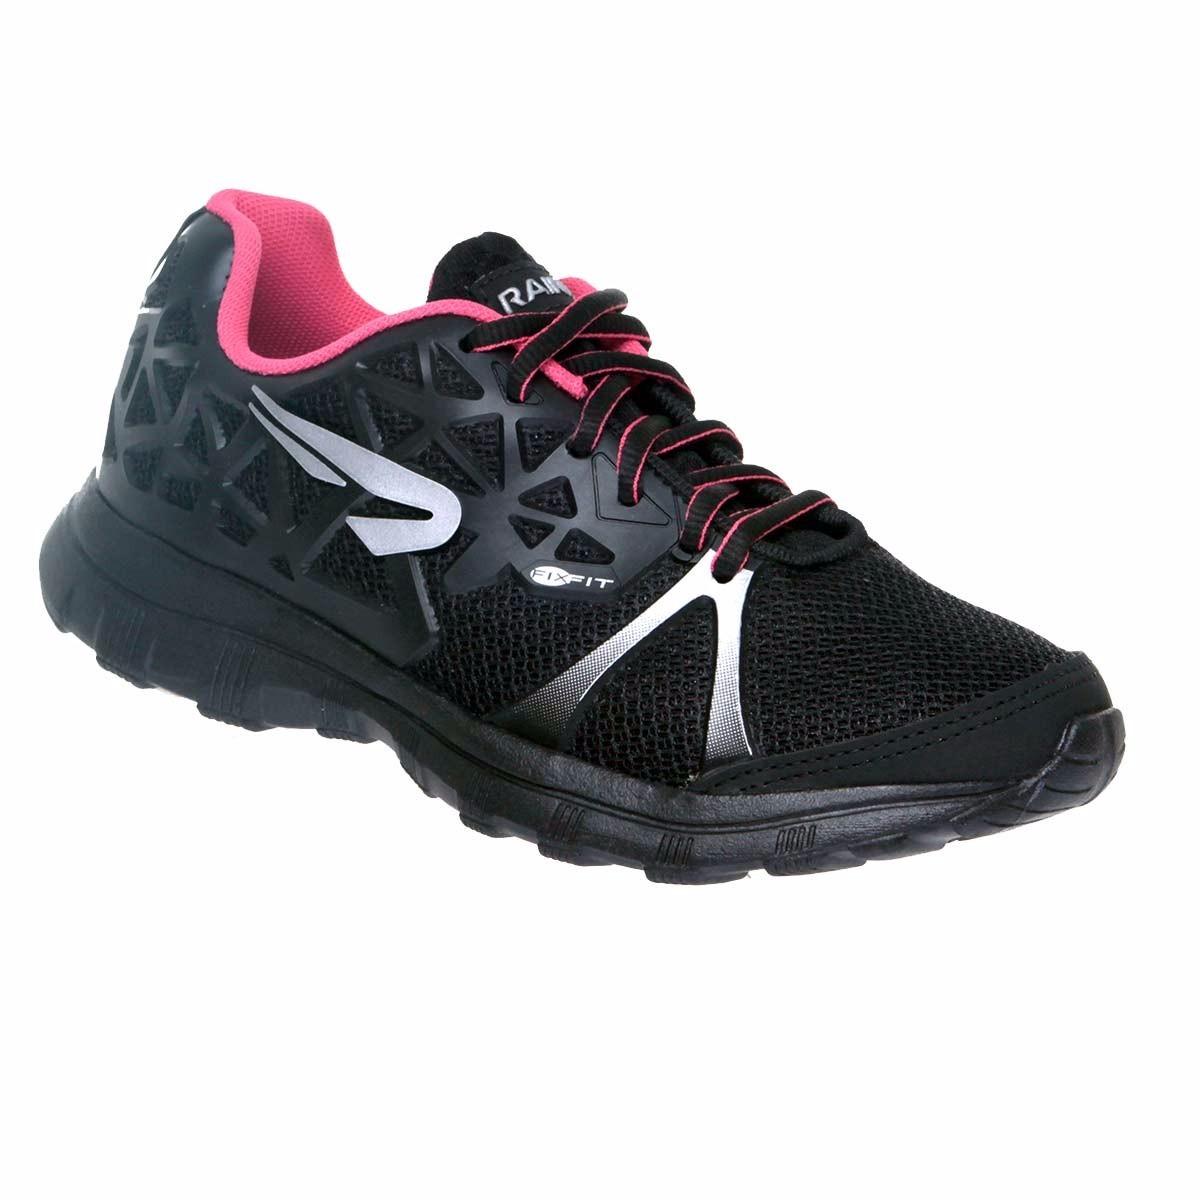 5868505bc50 tênis rainha udaka fix fit caminhada corrida feminino macio. Carregando  zoom.